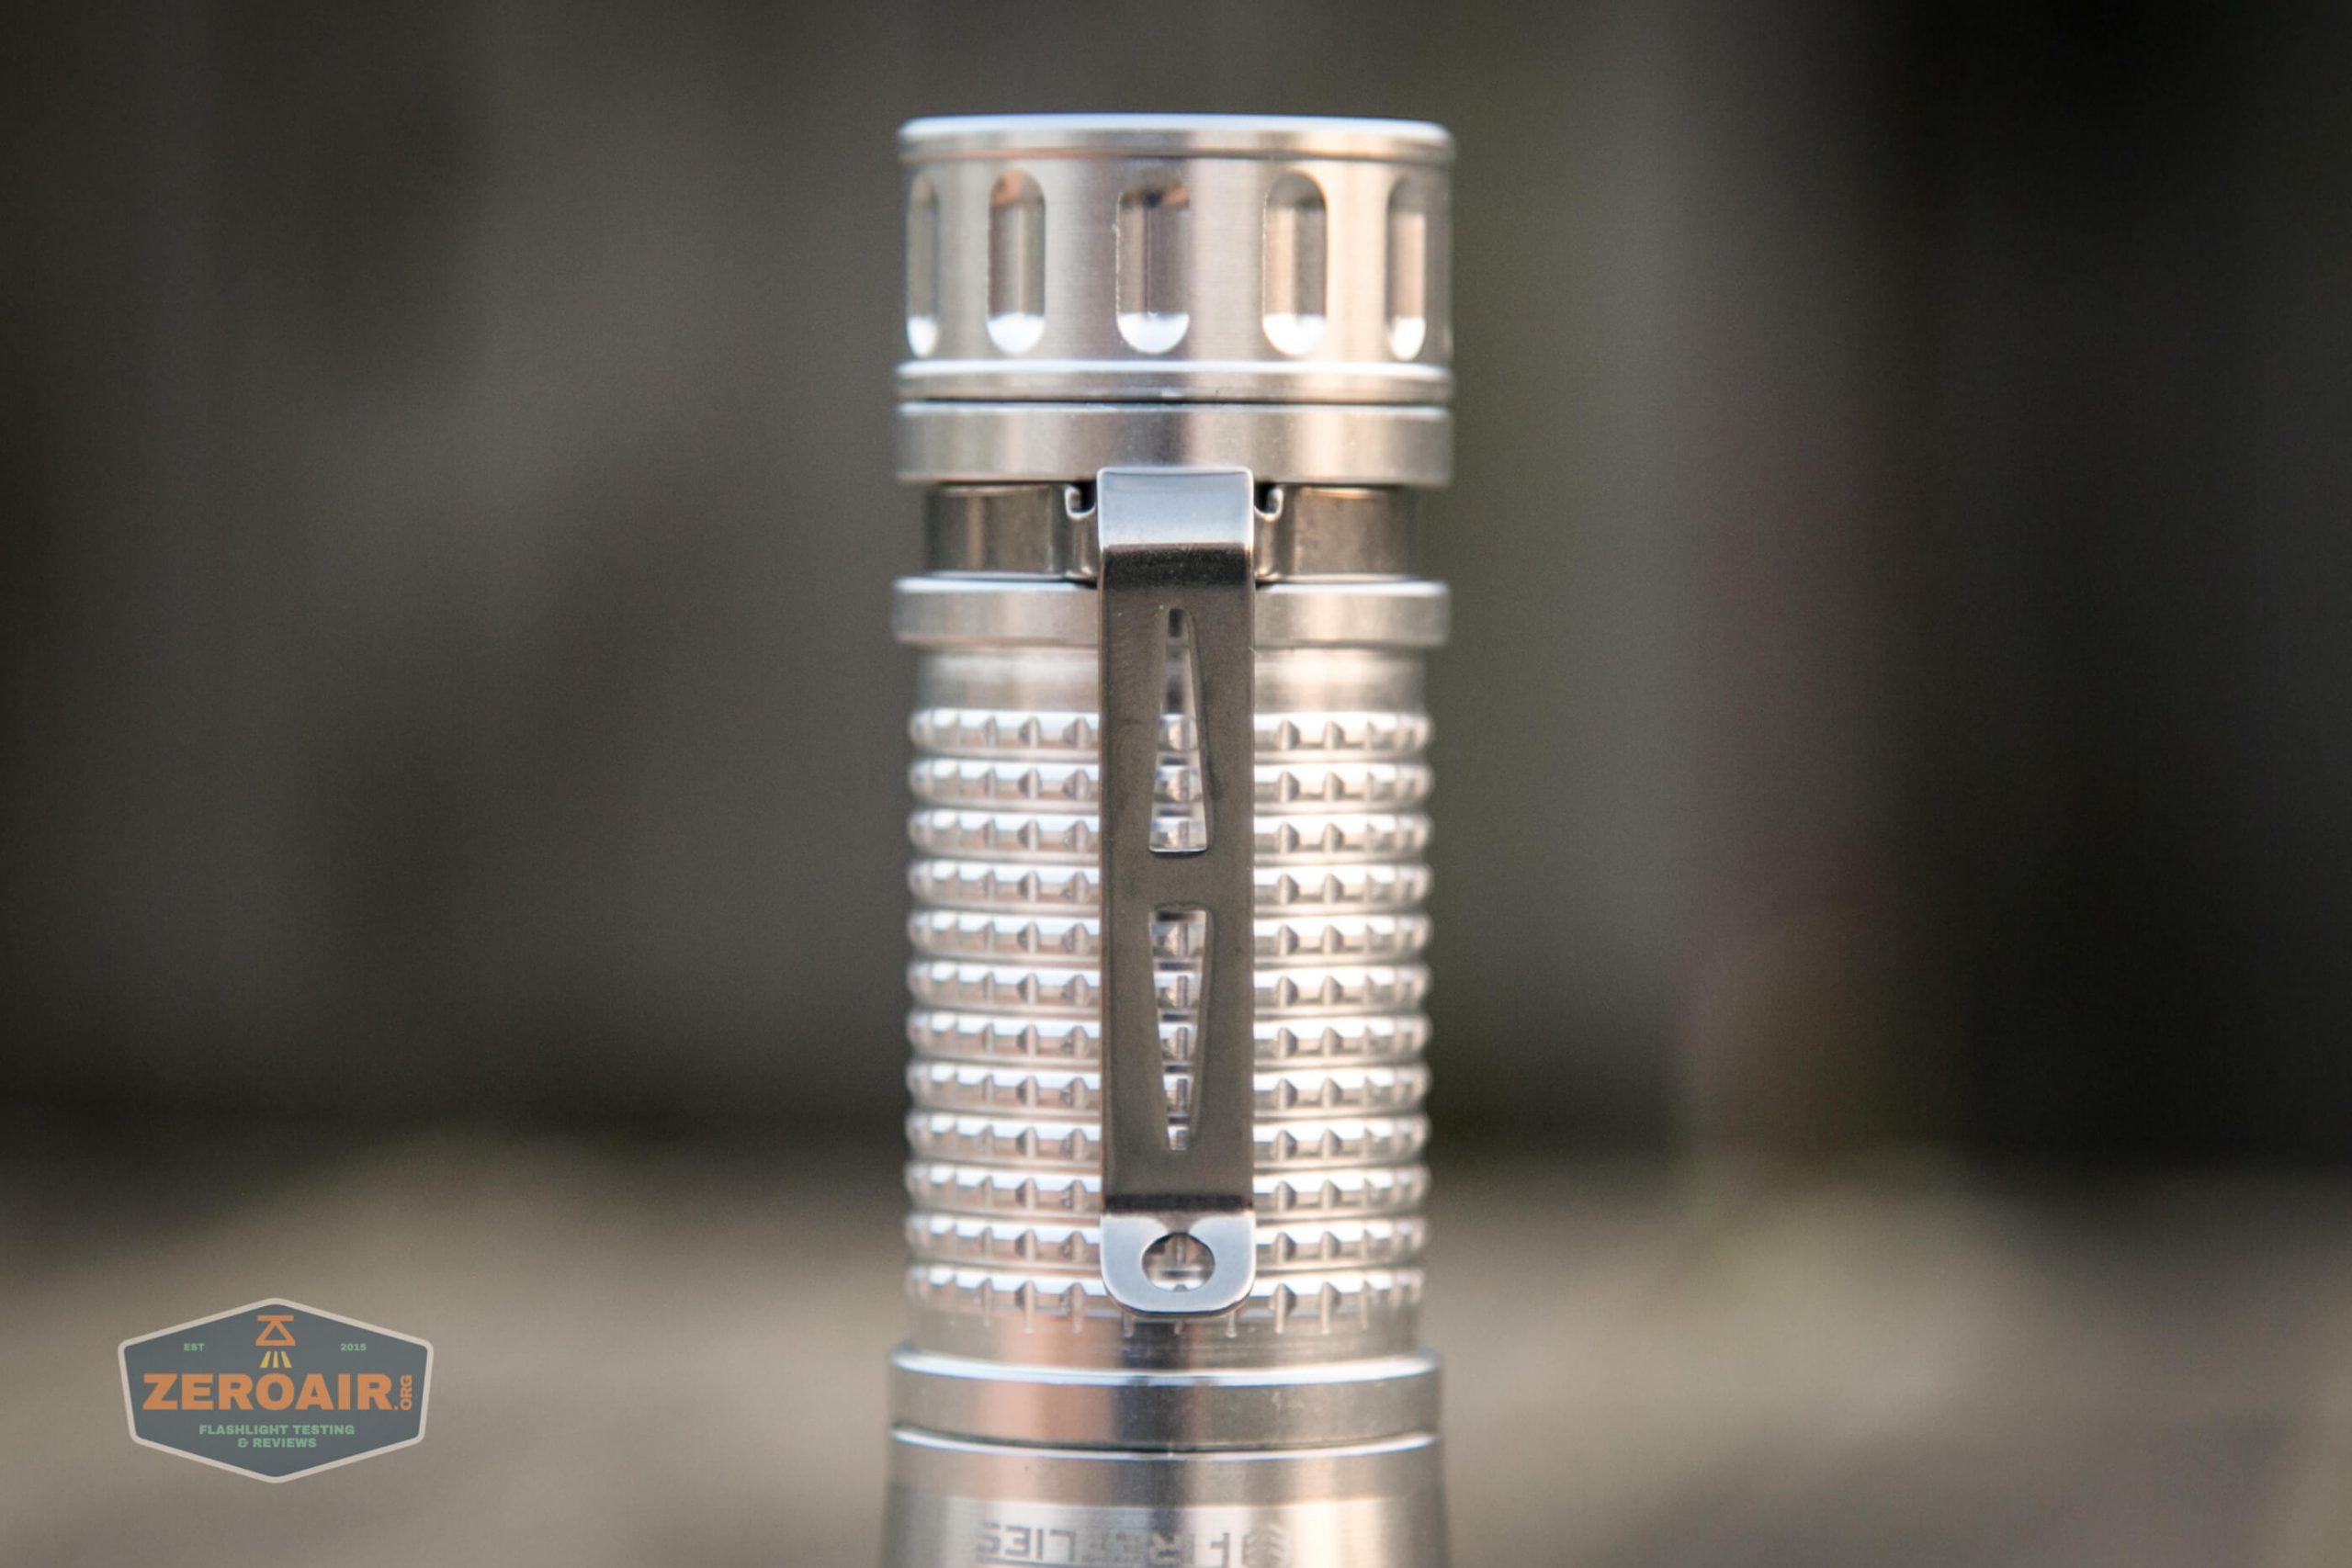 fireflylite e01 luminus sst-40 21700 pocket clip